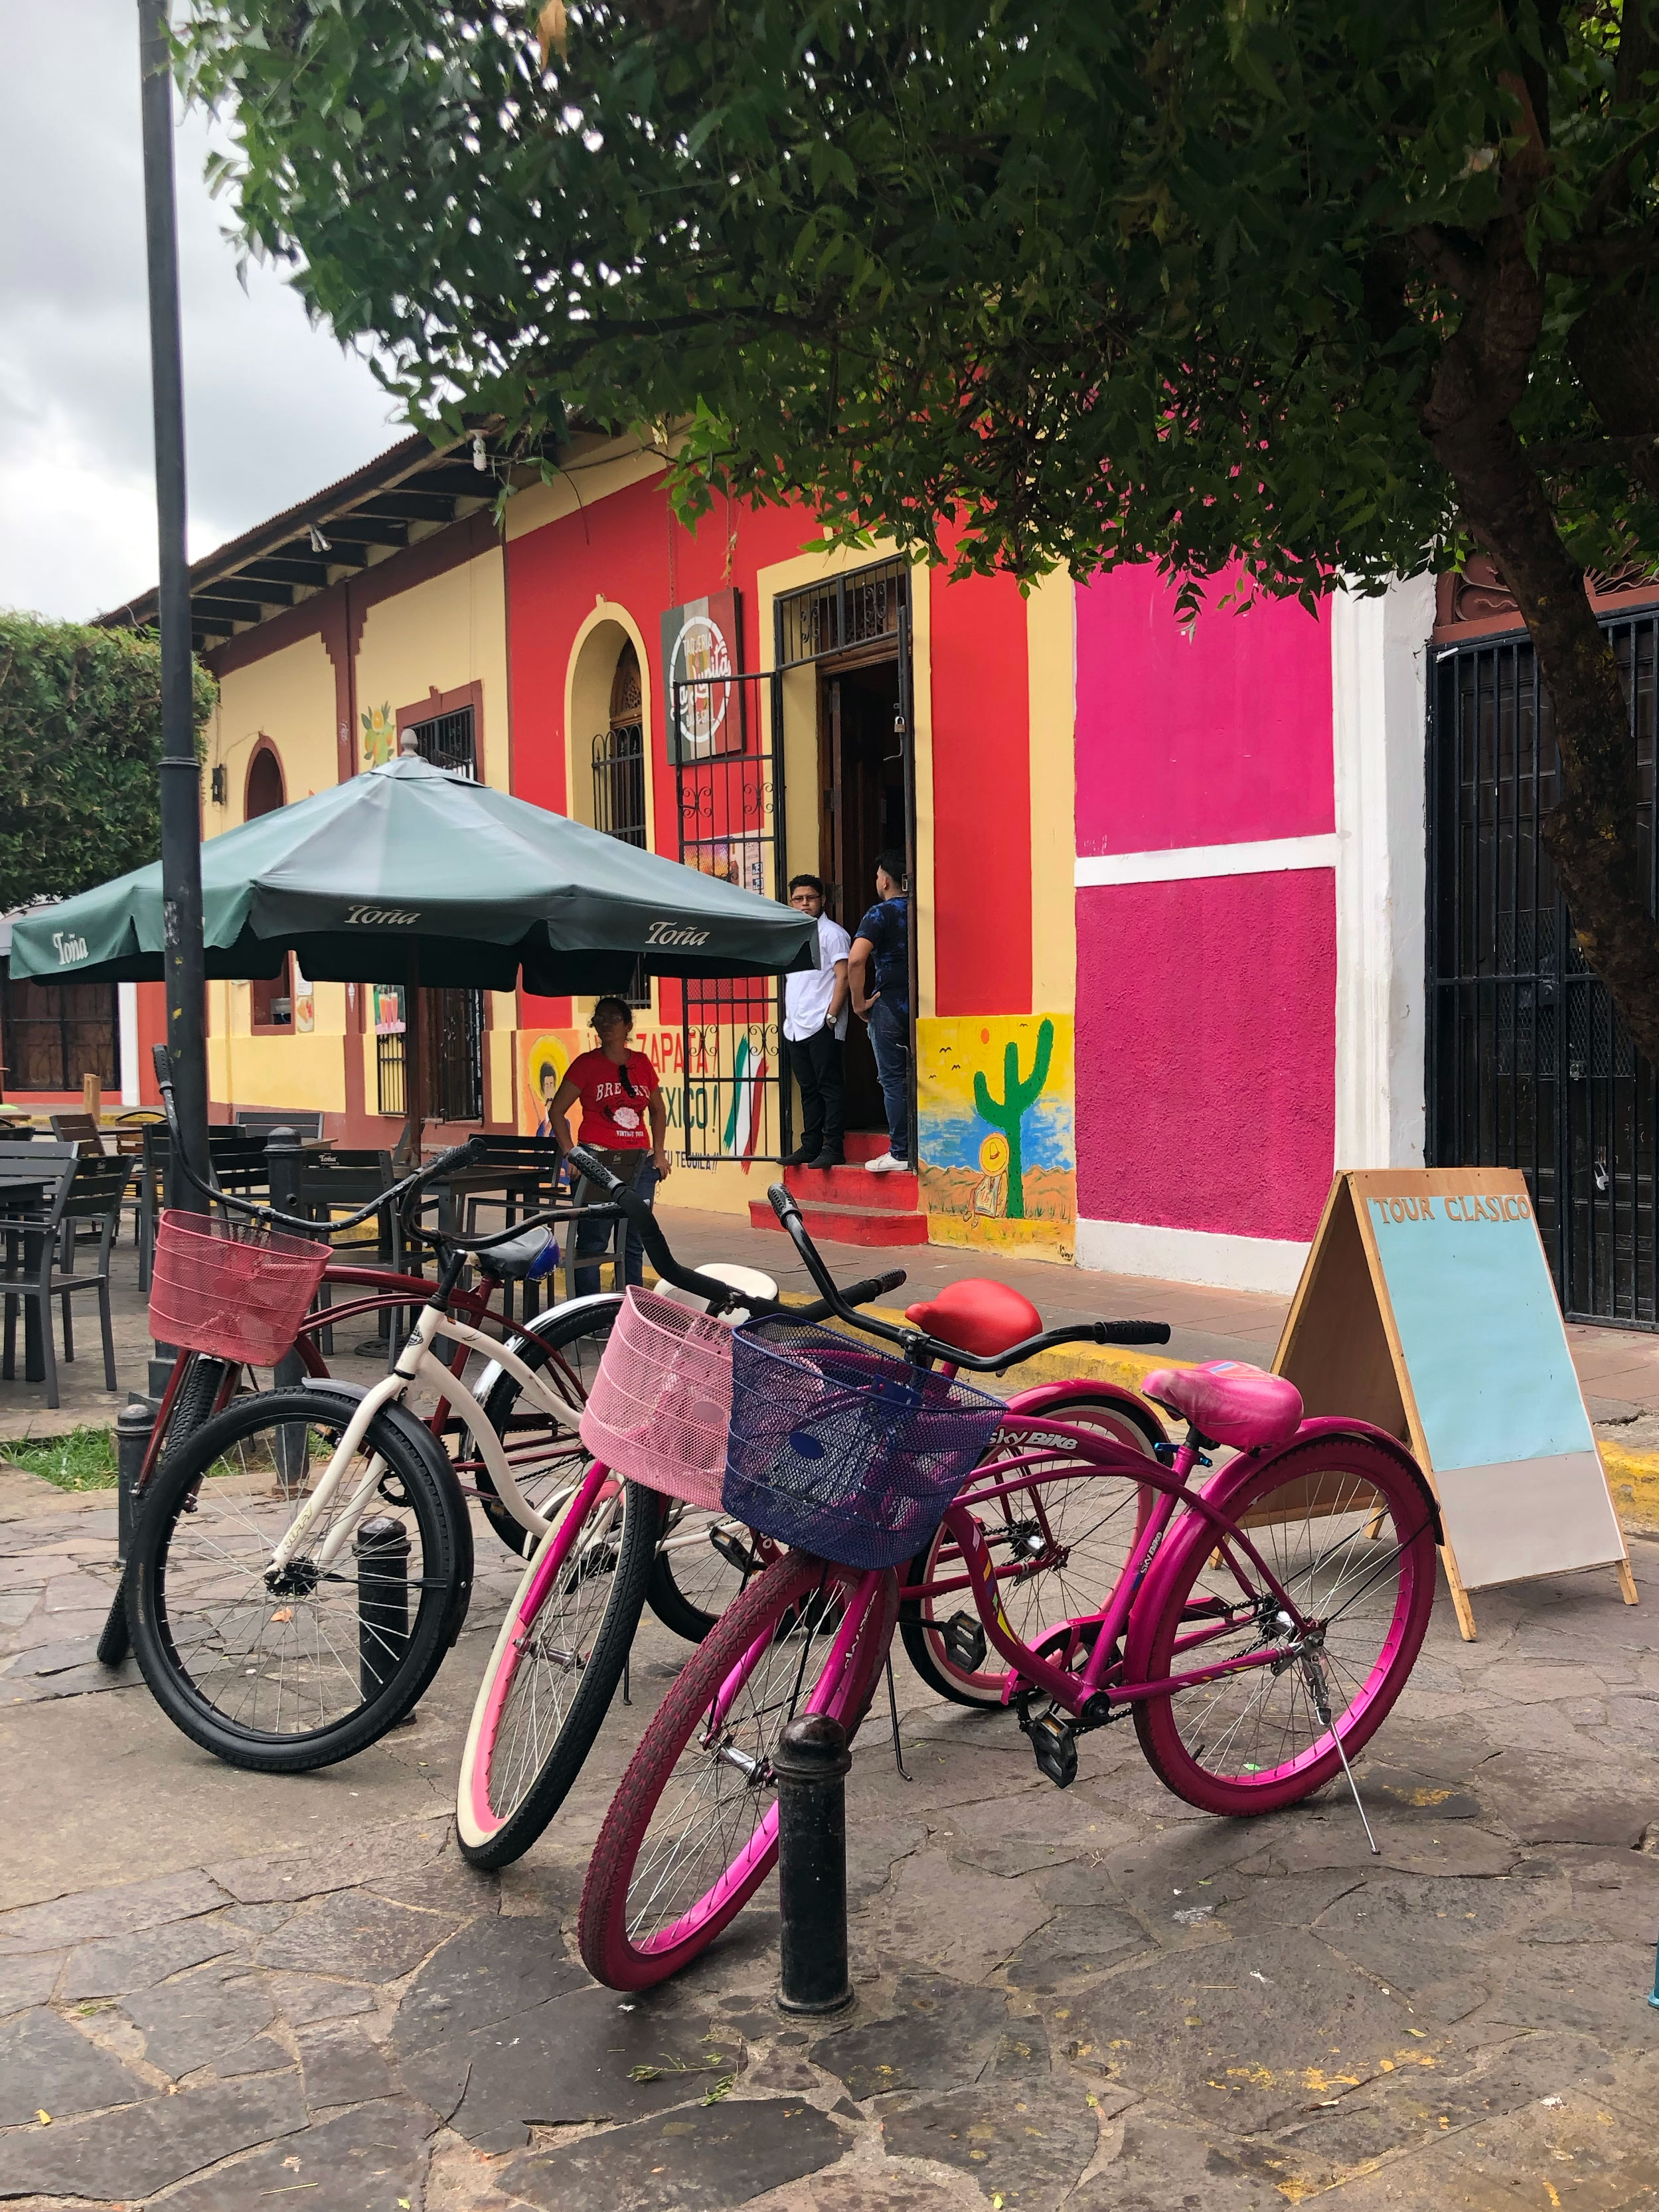 Granada | Granada, Nicaragua | Nicaragua | Granada Central Park | Nicaragua travel | Nicaragua bucket list | Nicaragua travel guide | Ana Jacqueline | anajacqueline.com